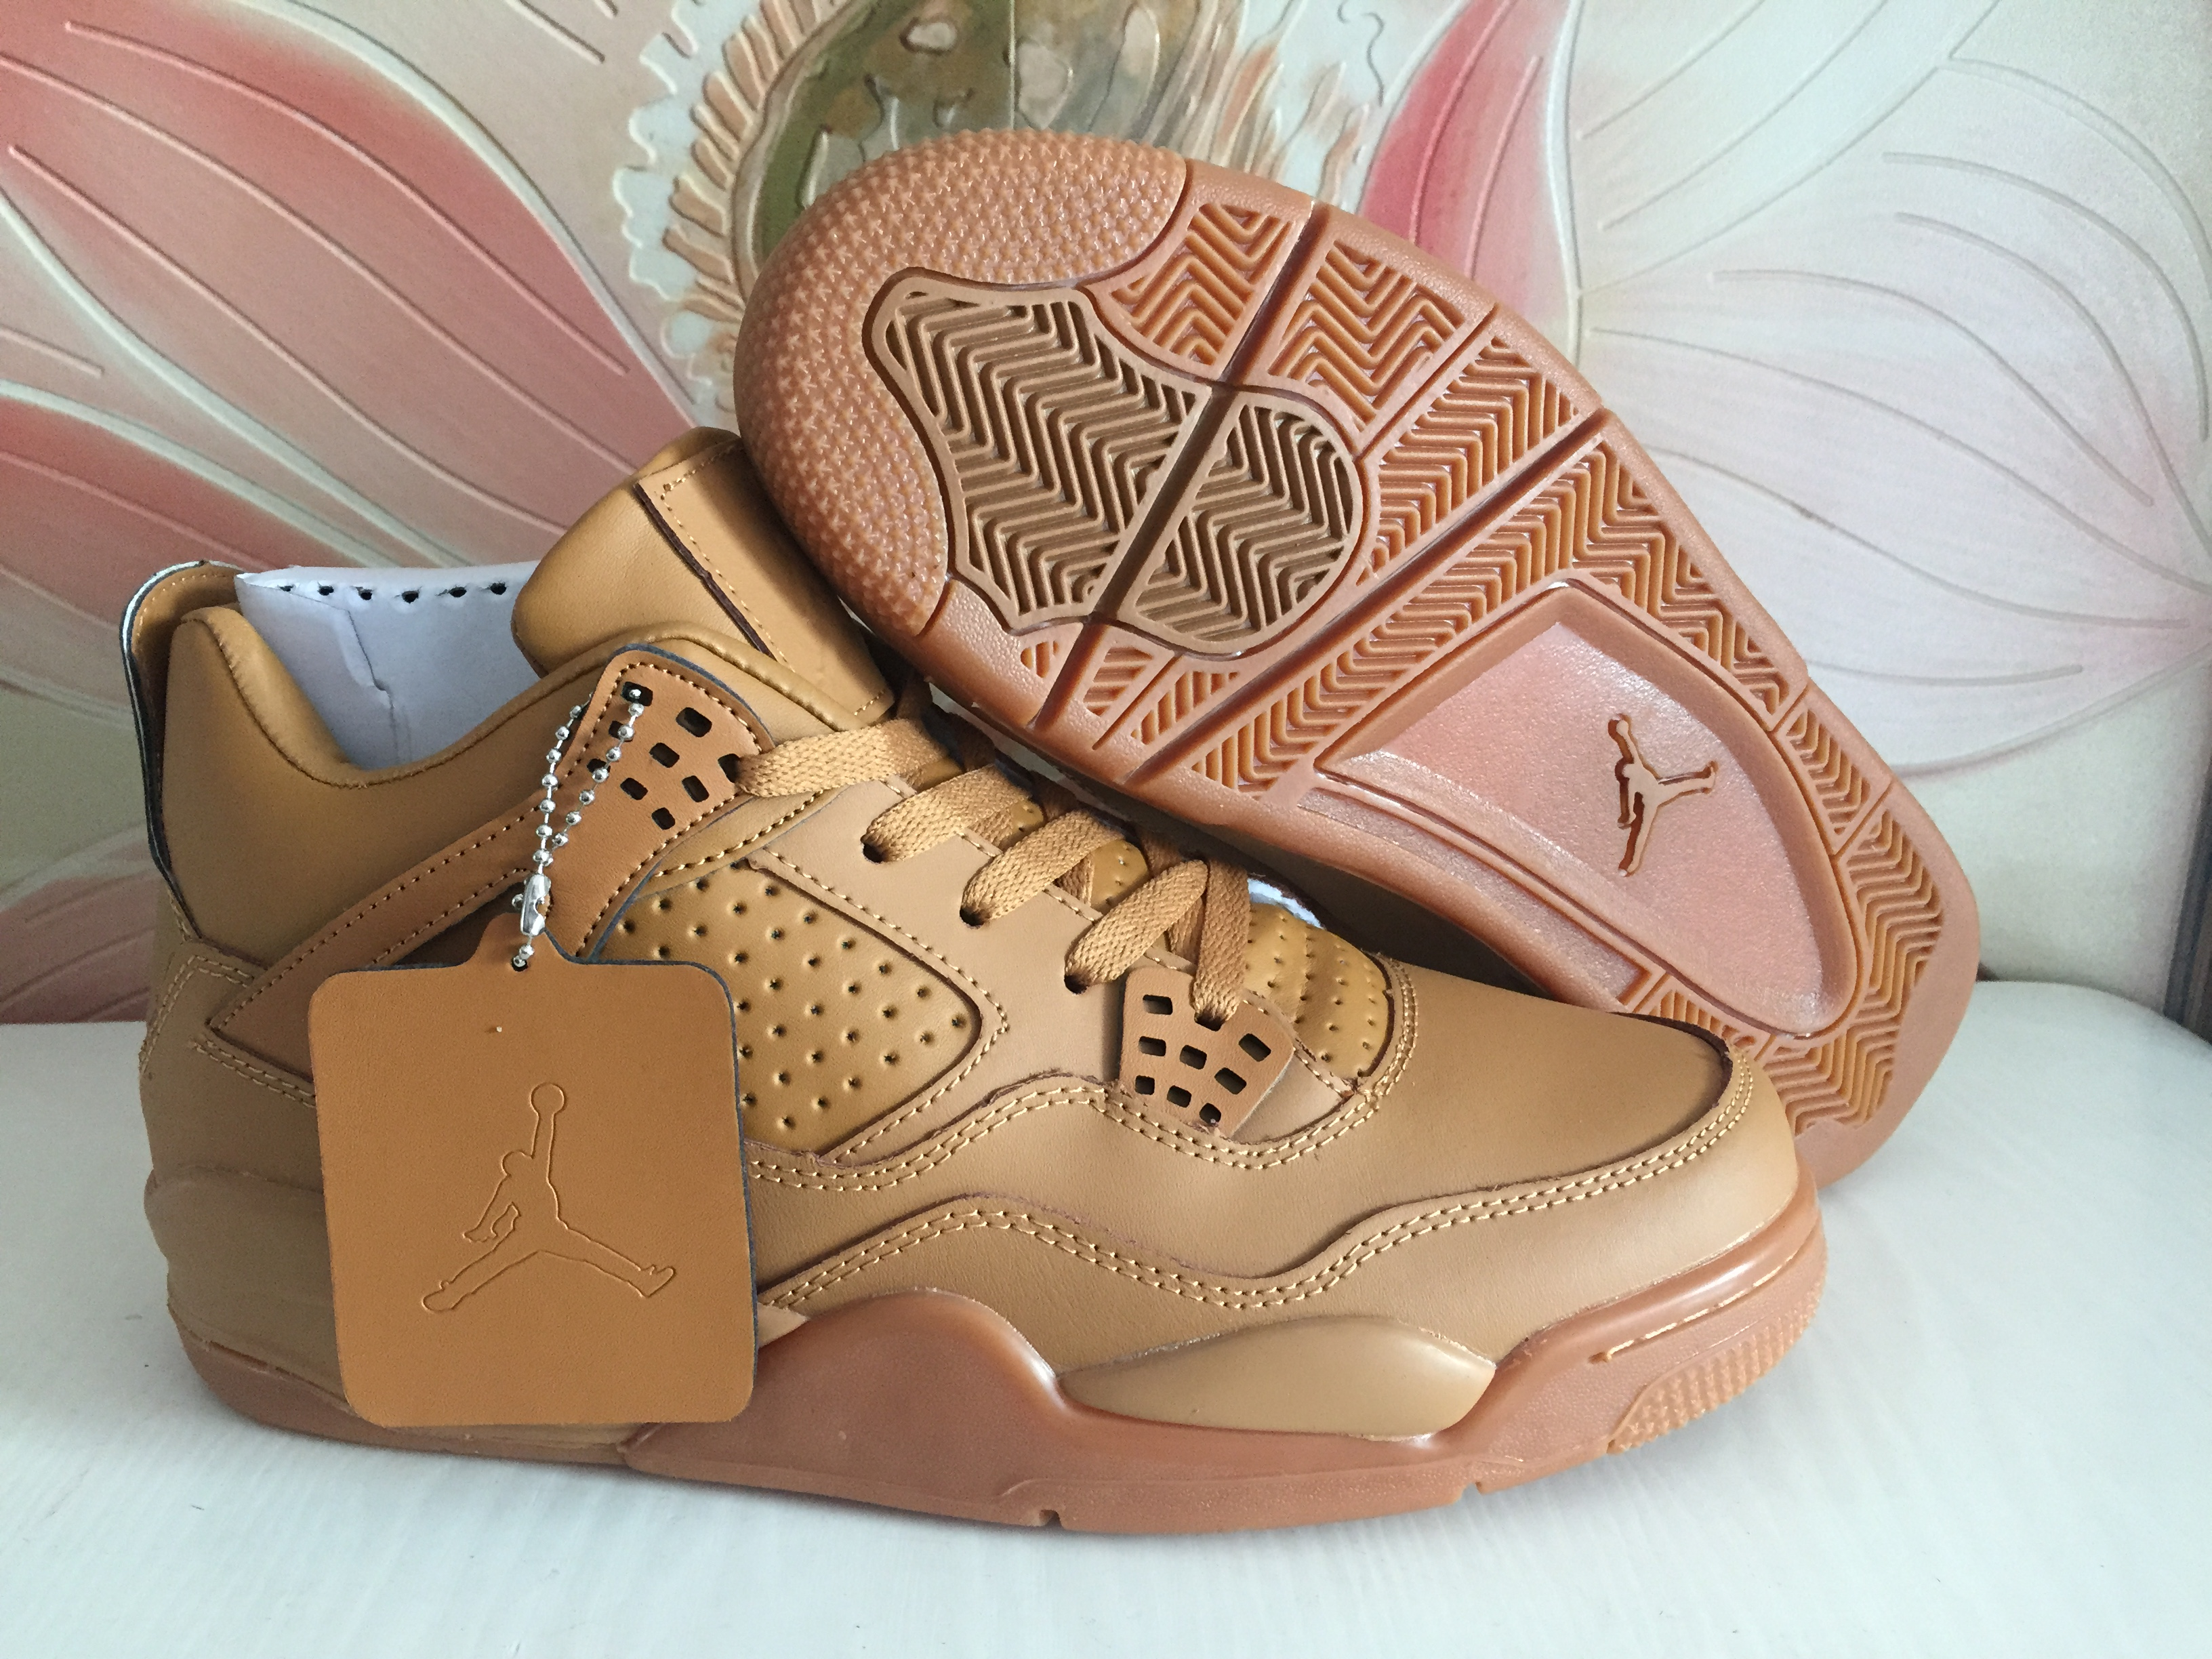 2018 Air Jordan 4 Wheat Yellow Shoes